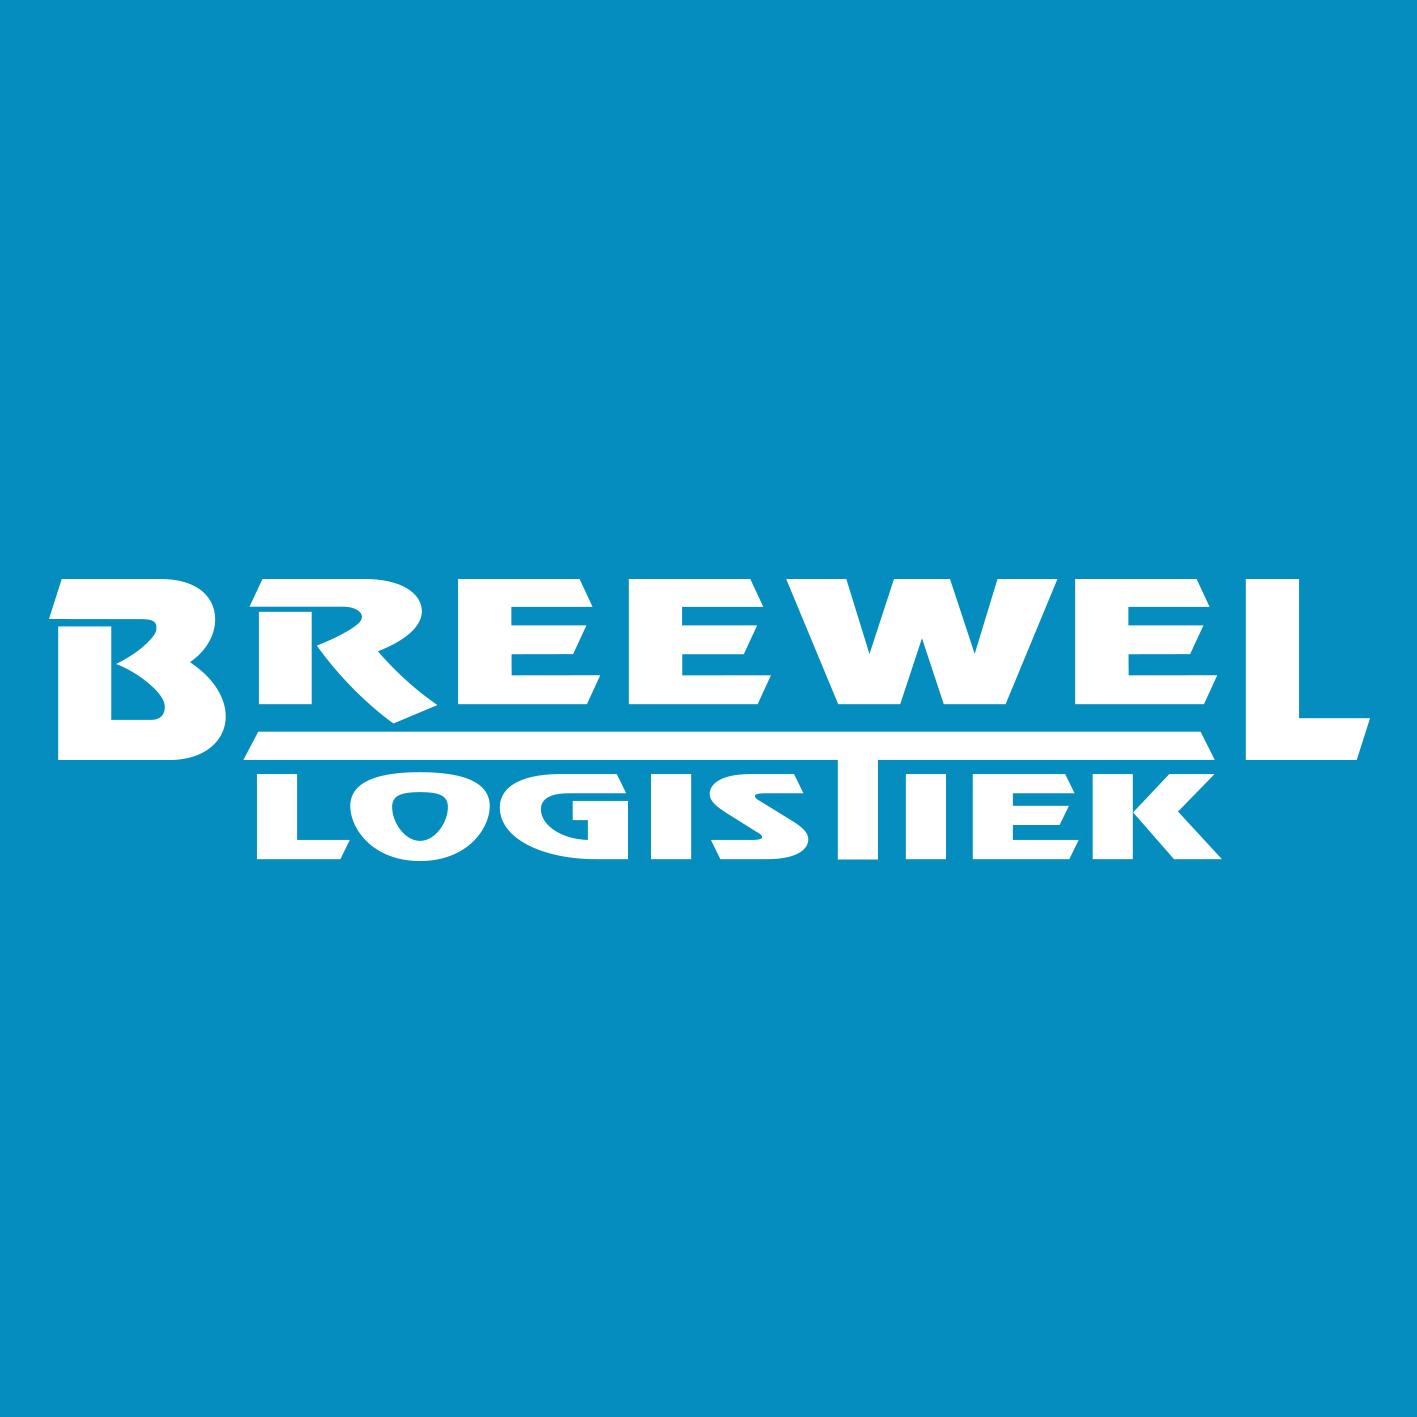 Breewel logistiek, ArboVita